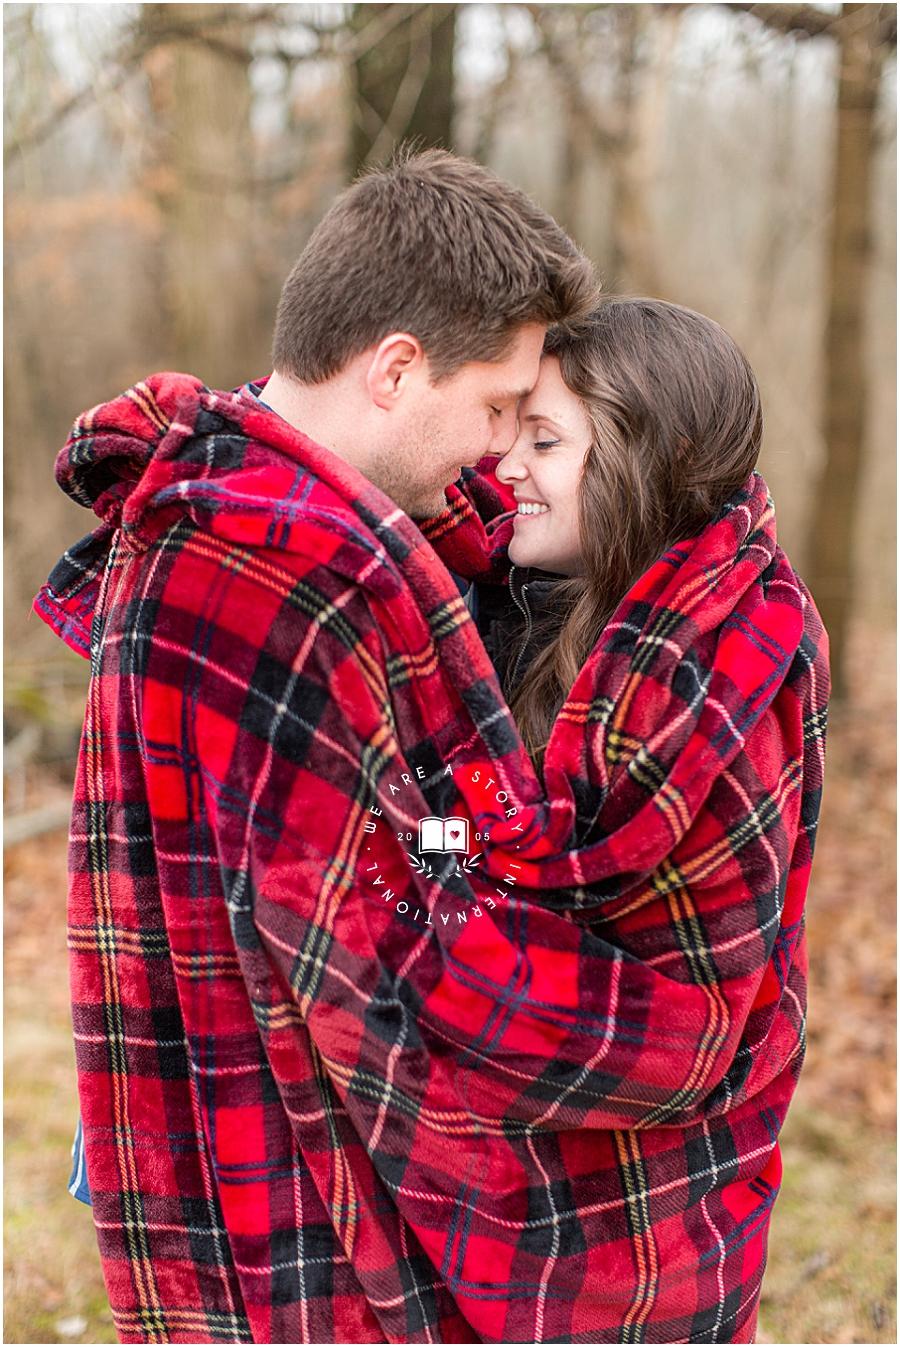 Cincinnati Wedding Photographer_We Are A Story_Molly & Matt Engagement Session_2554.jpg